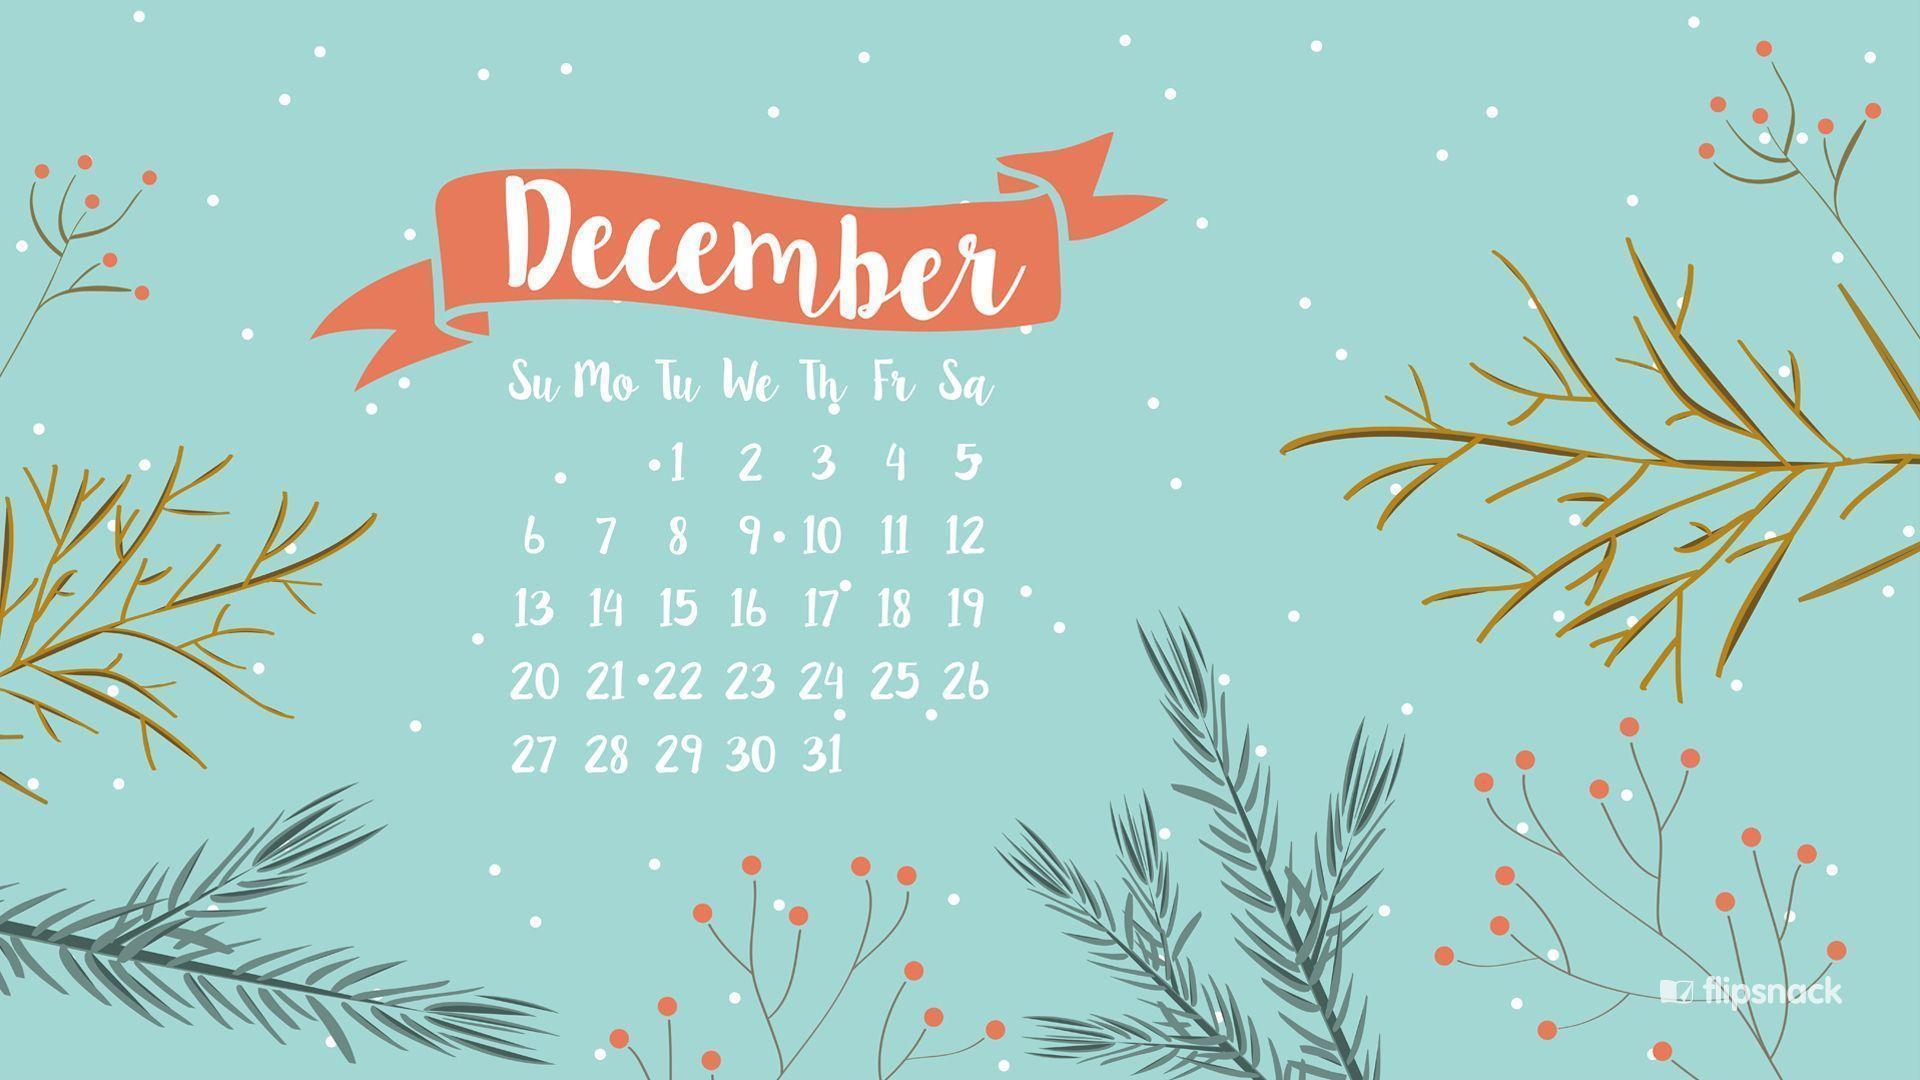 desktop wallpapers calendar december 2016 - wallpaper cave